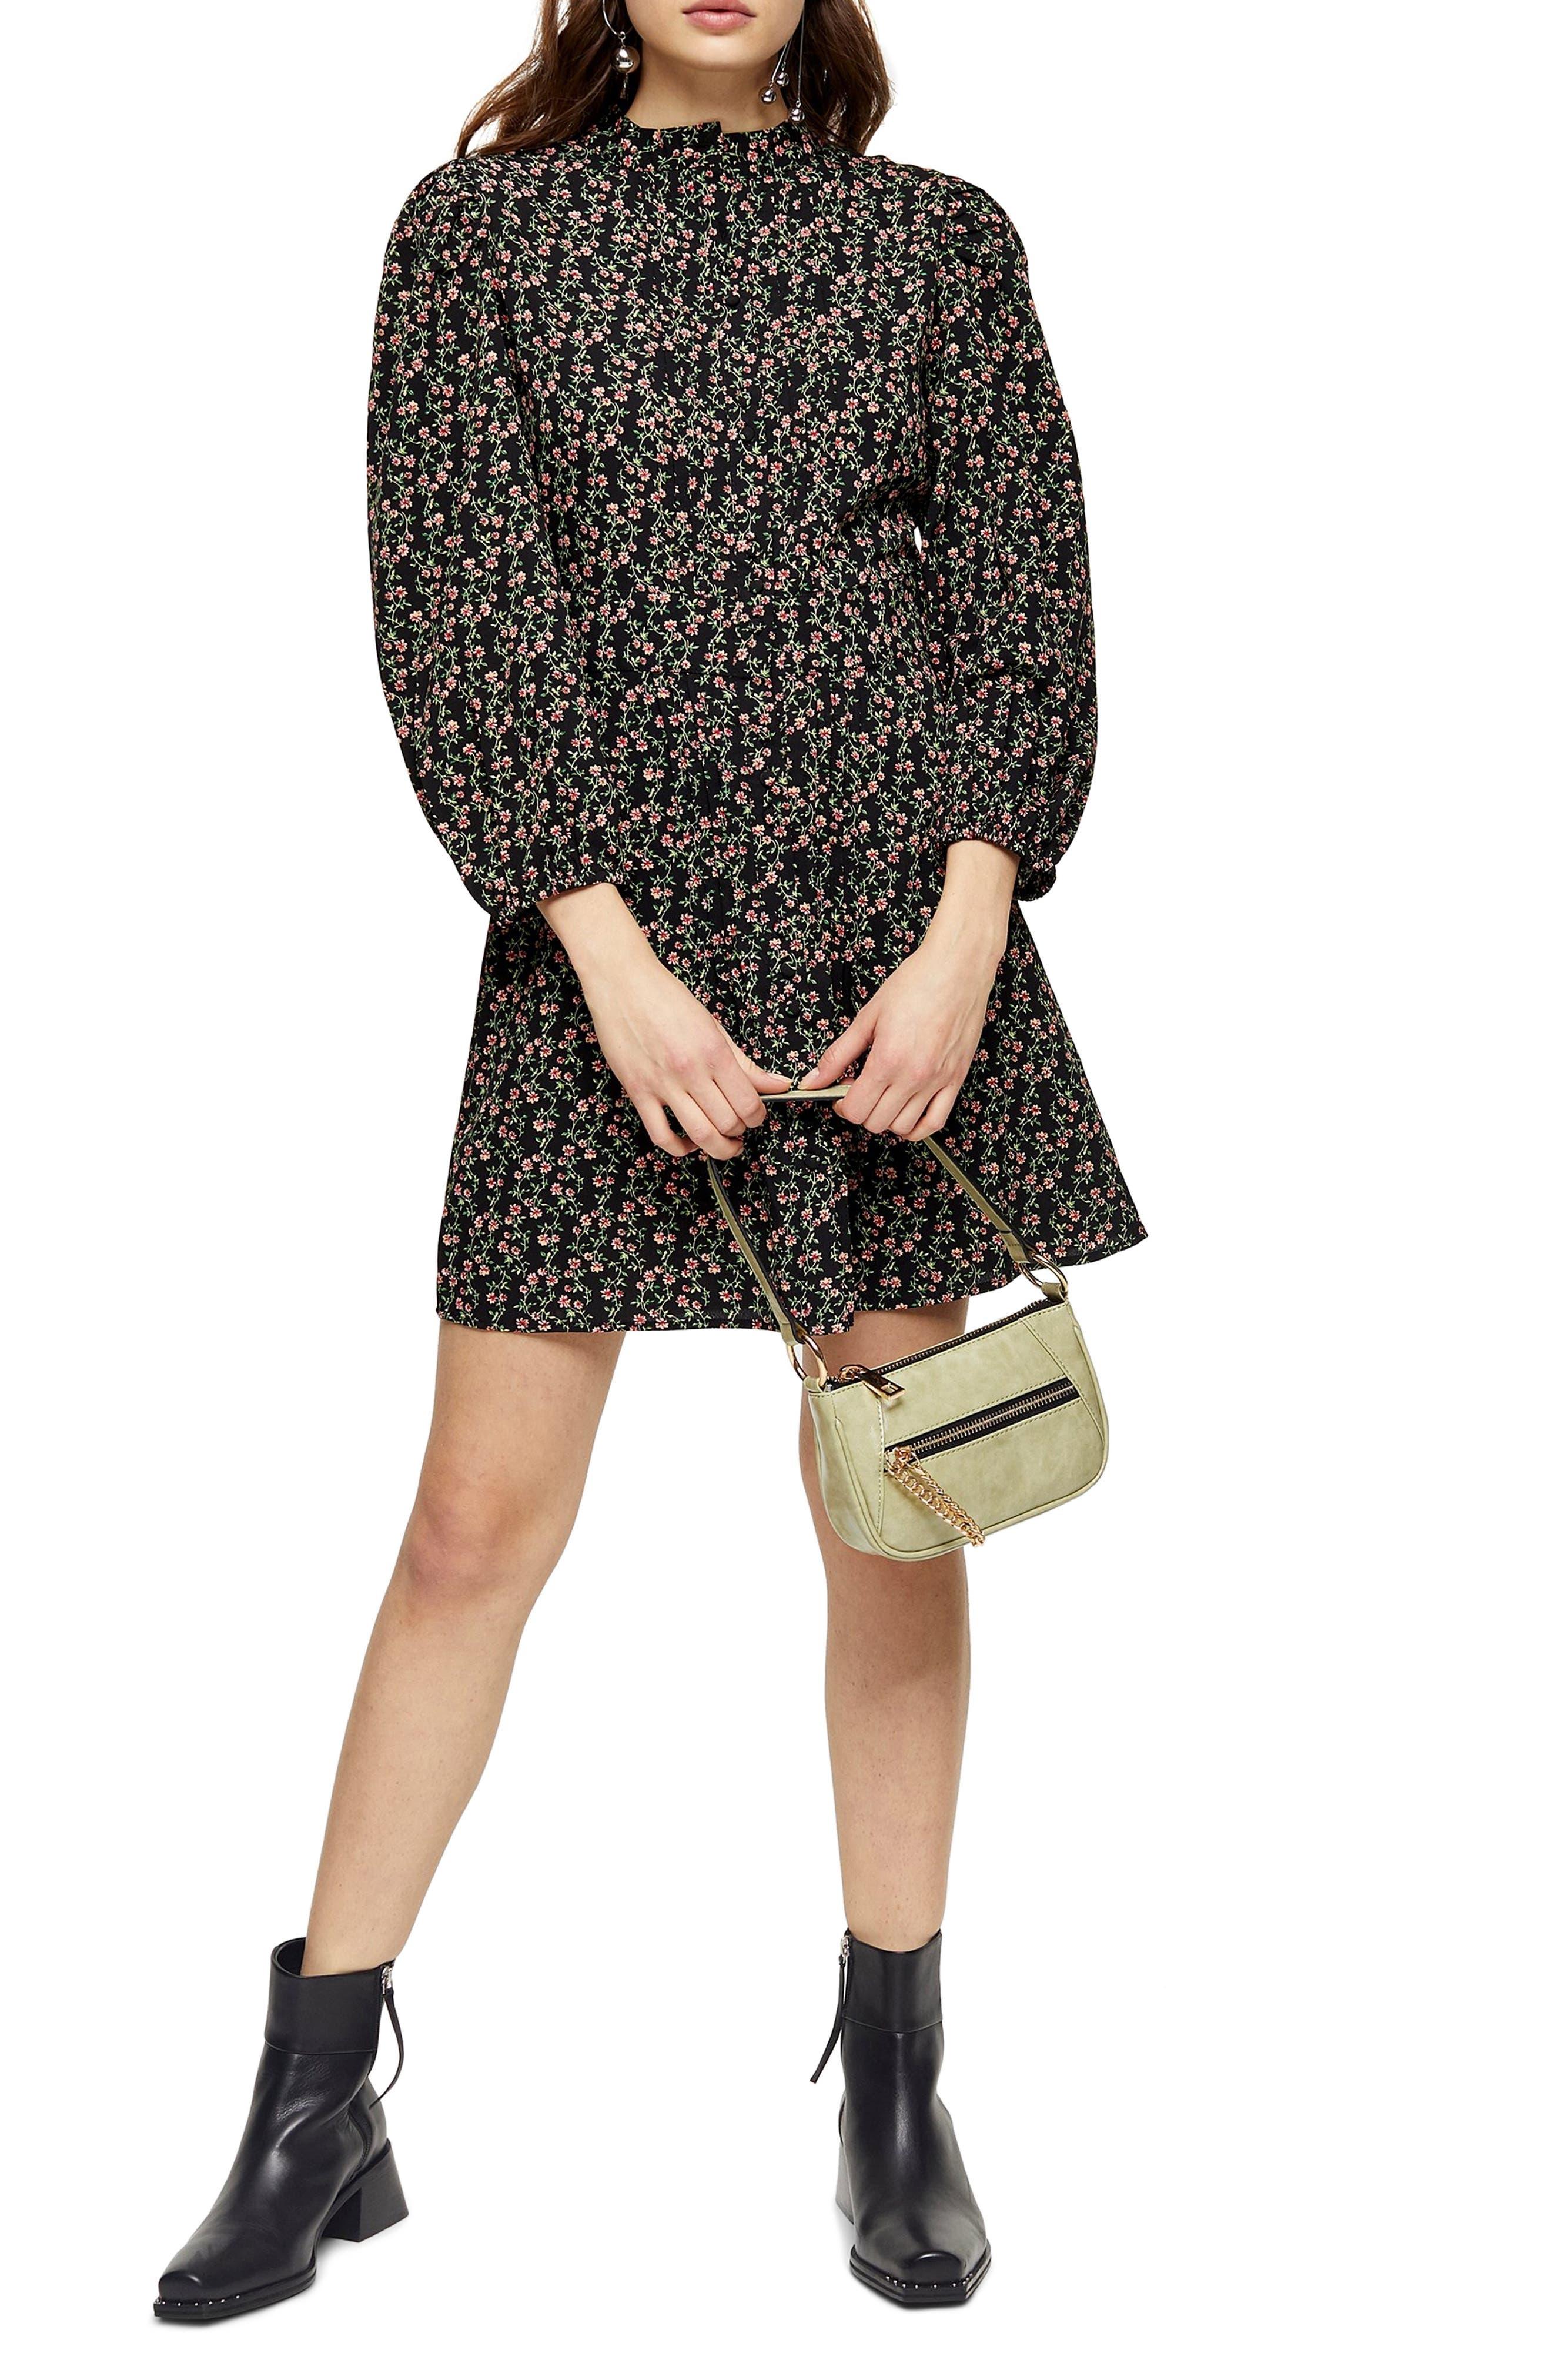 ex-Topshop Check V-Neck Mini-Plaid Dress Sleeveless Summer Branded Sizes 6 to 14